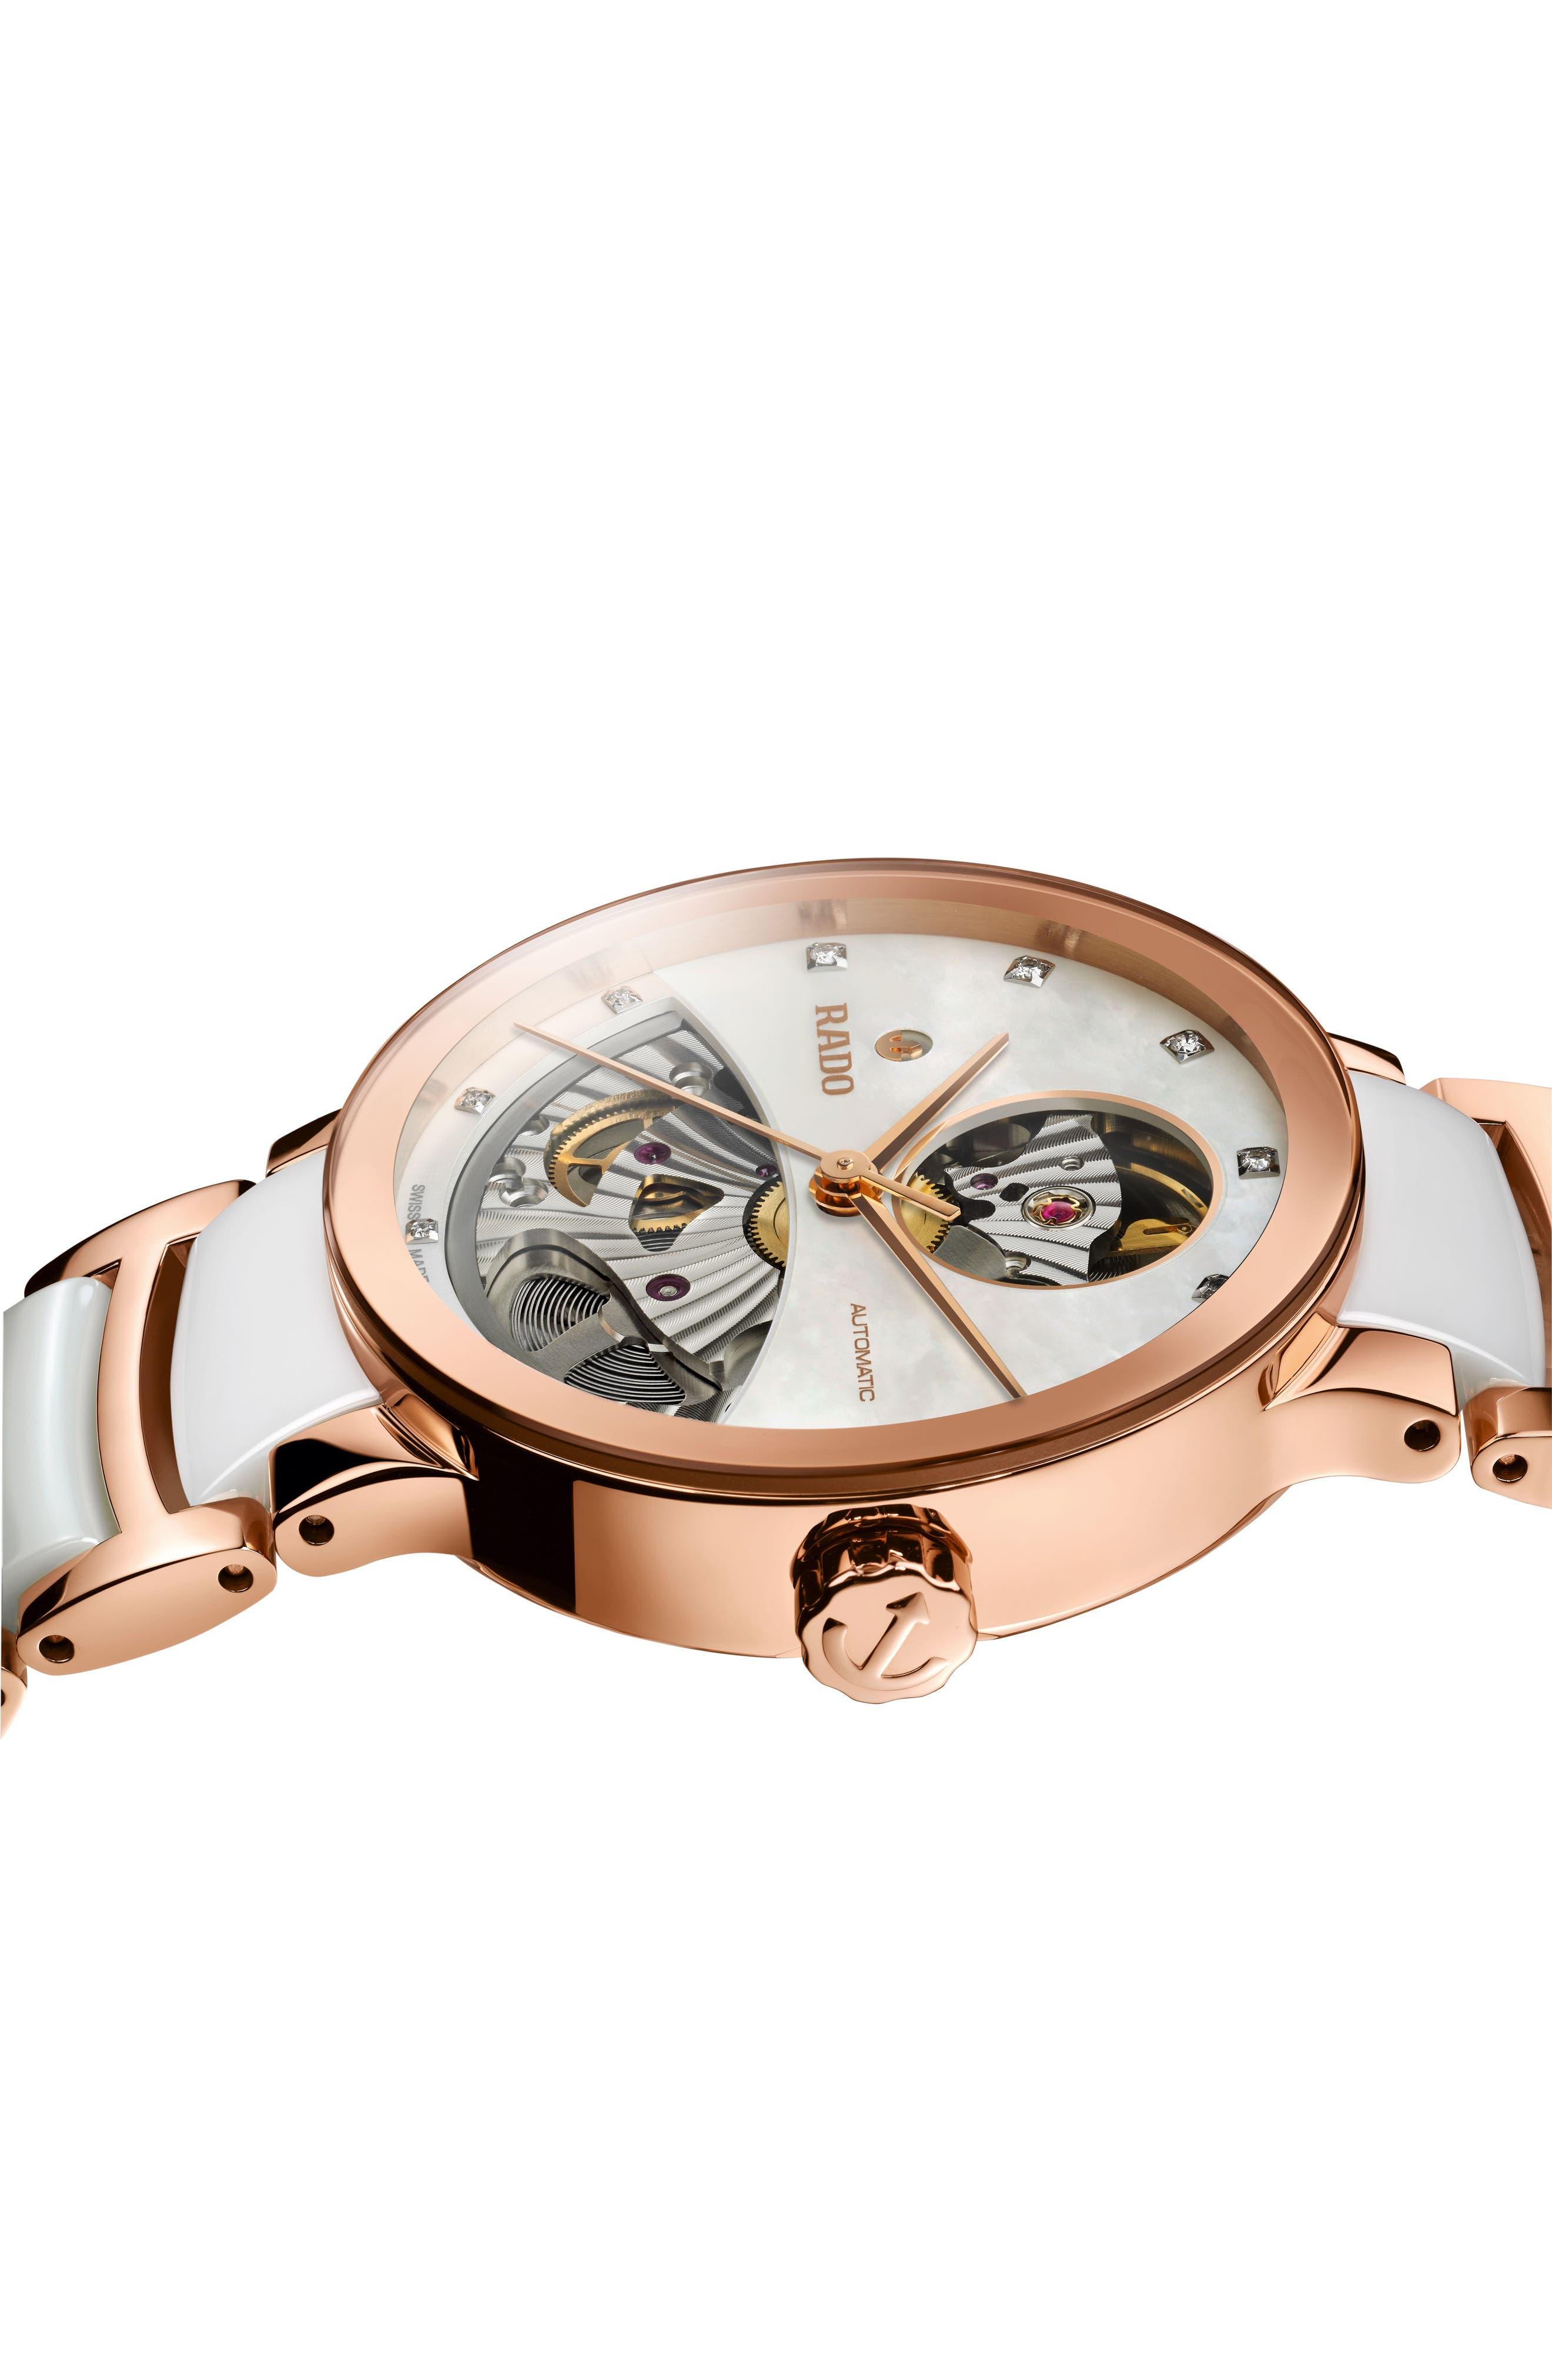 Centrix Open Heart Automatic Diamond Ceramic Bracelet Watch, 33mm,                             Alternate thumbnail 3, color,                             White/ Mop/ Rose Gold